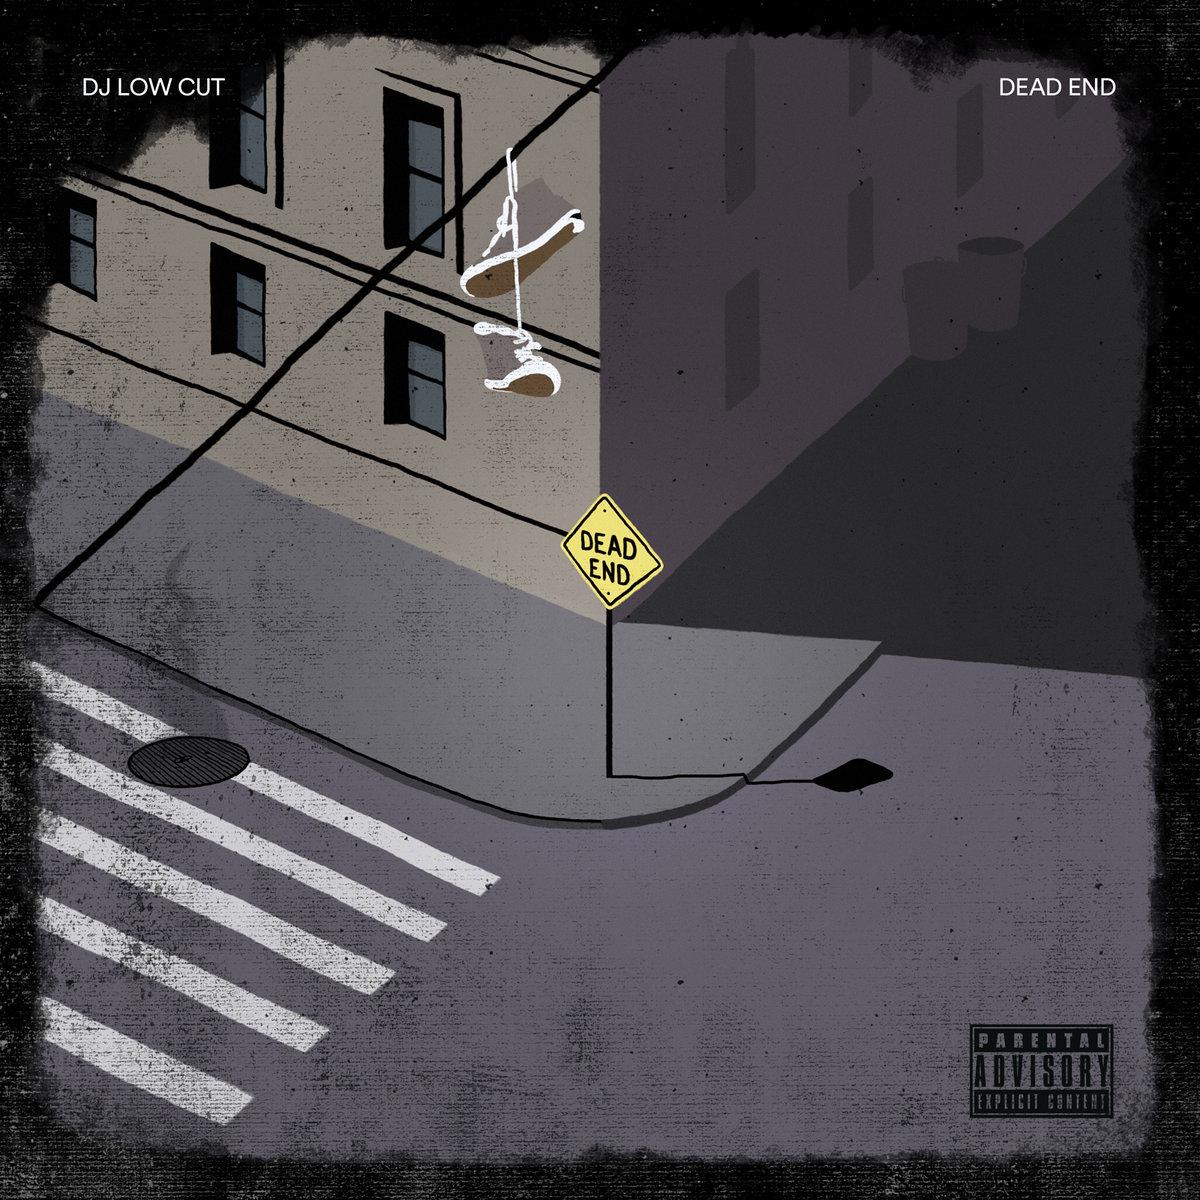 Dead End (Instrumental & Acapella) | Dj Low Cut